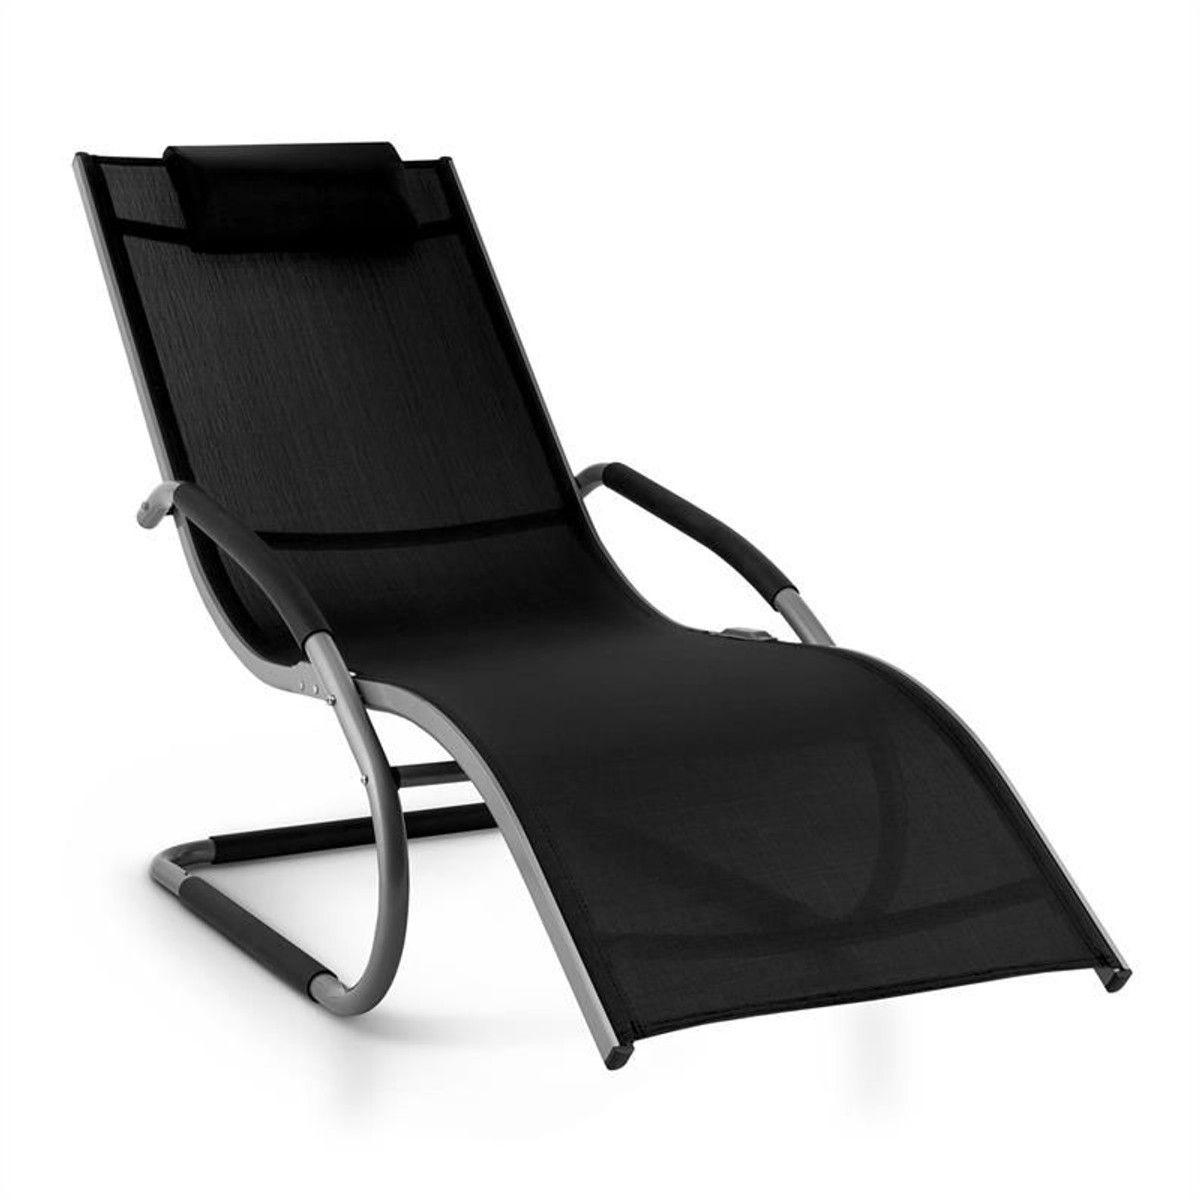 Sunwave Chaise Longue Transat Relax Aluminium Noir en 2019 ...